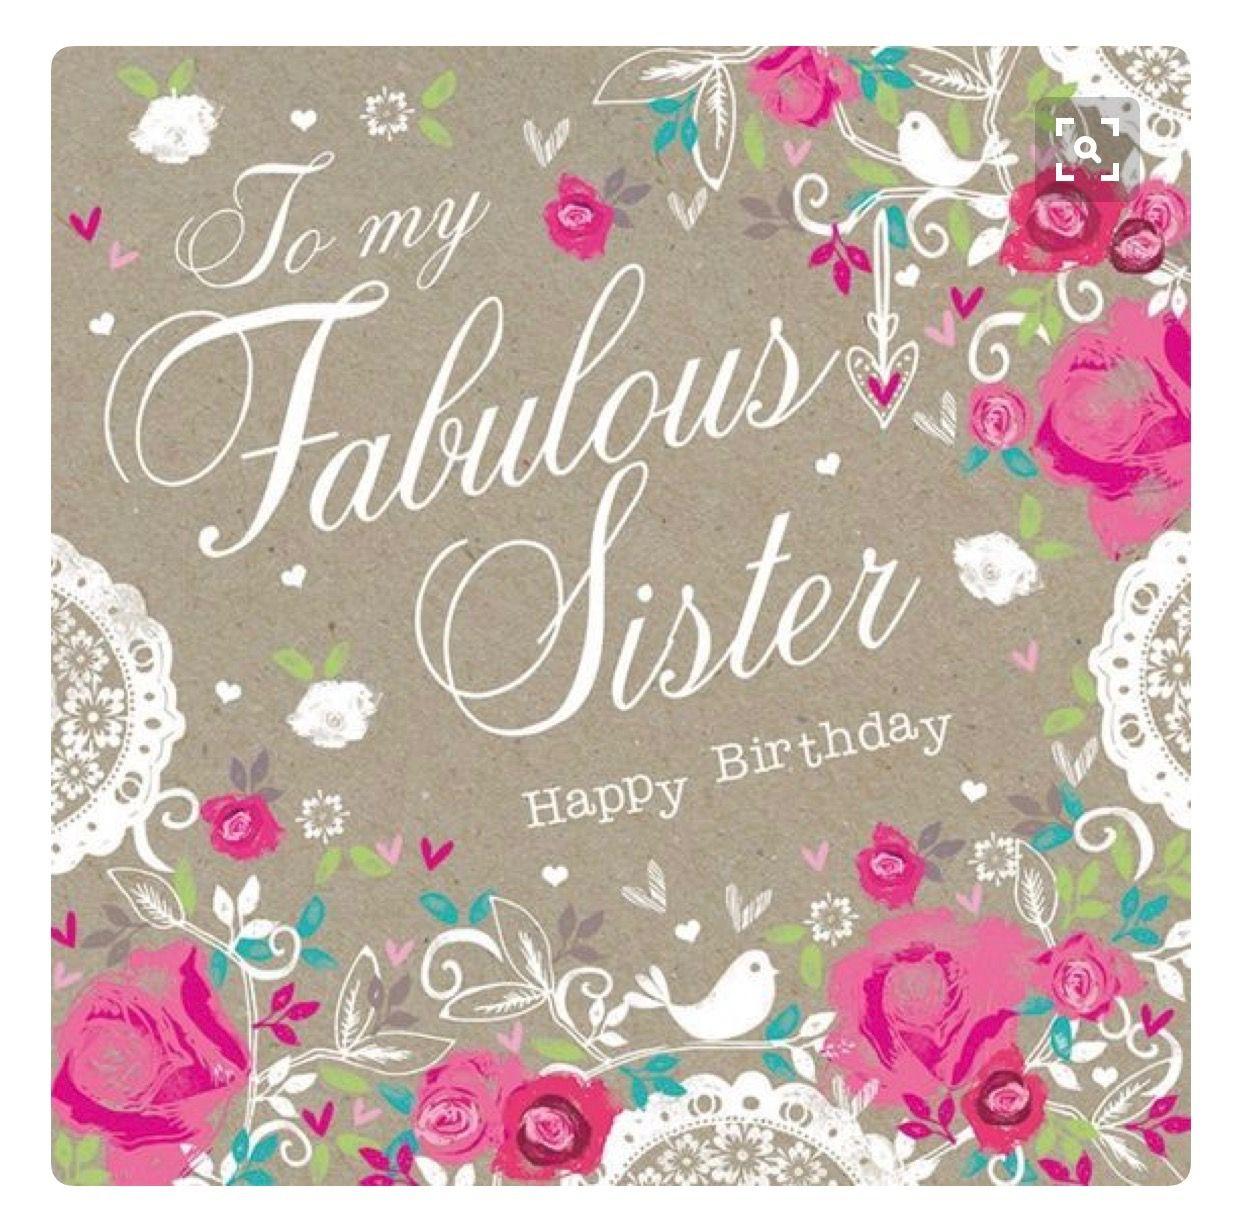 Pin by Dettie on Happy Birthday Pinterest Happy bday